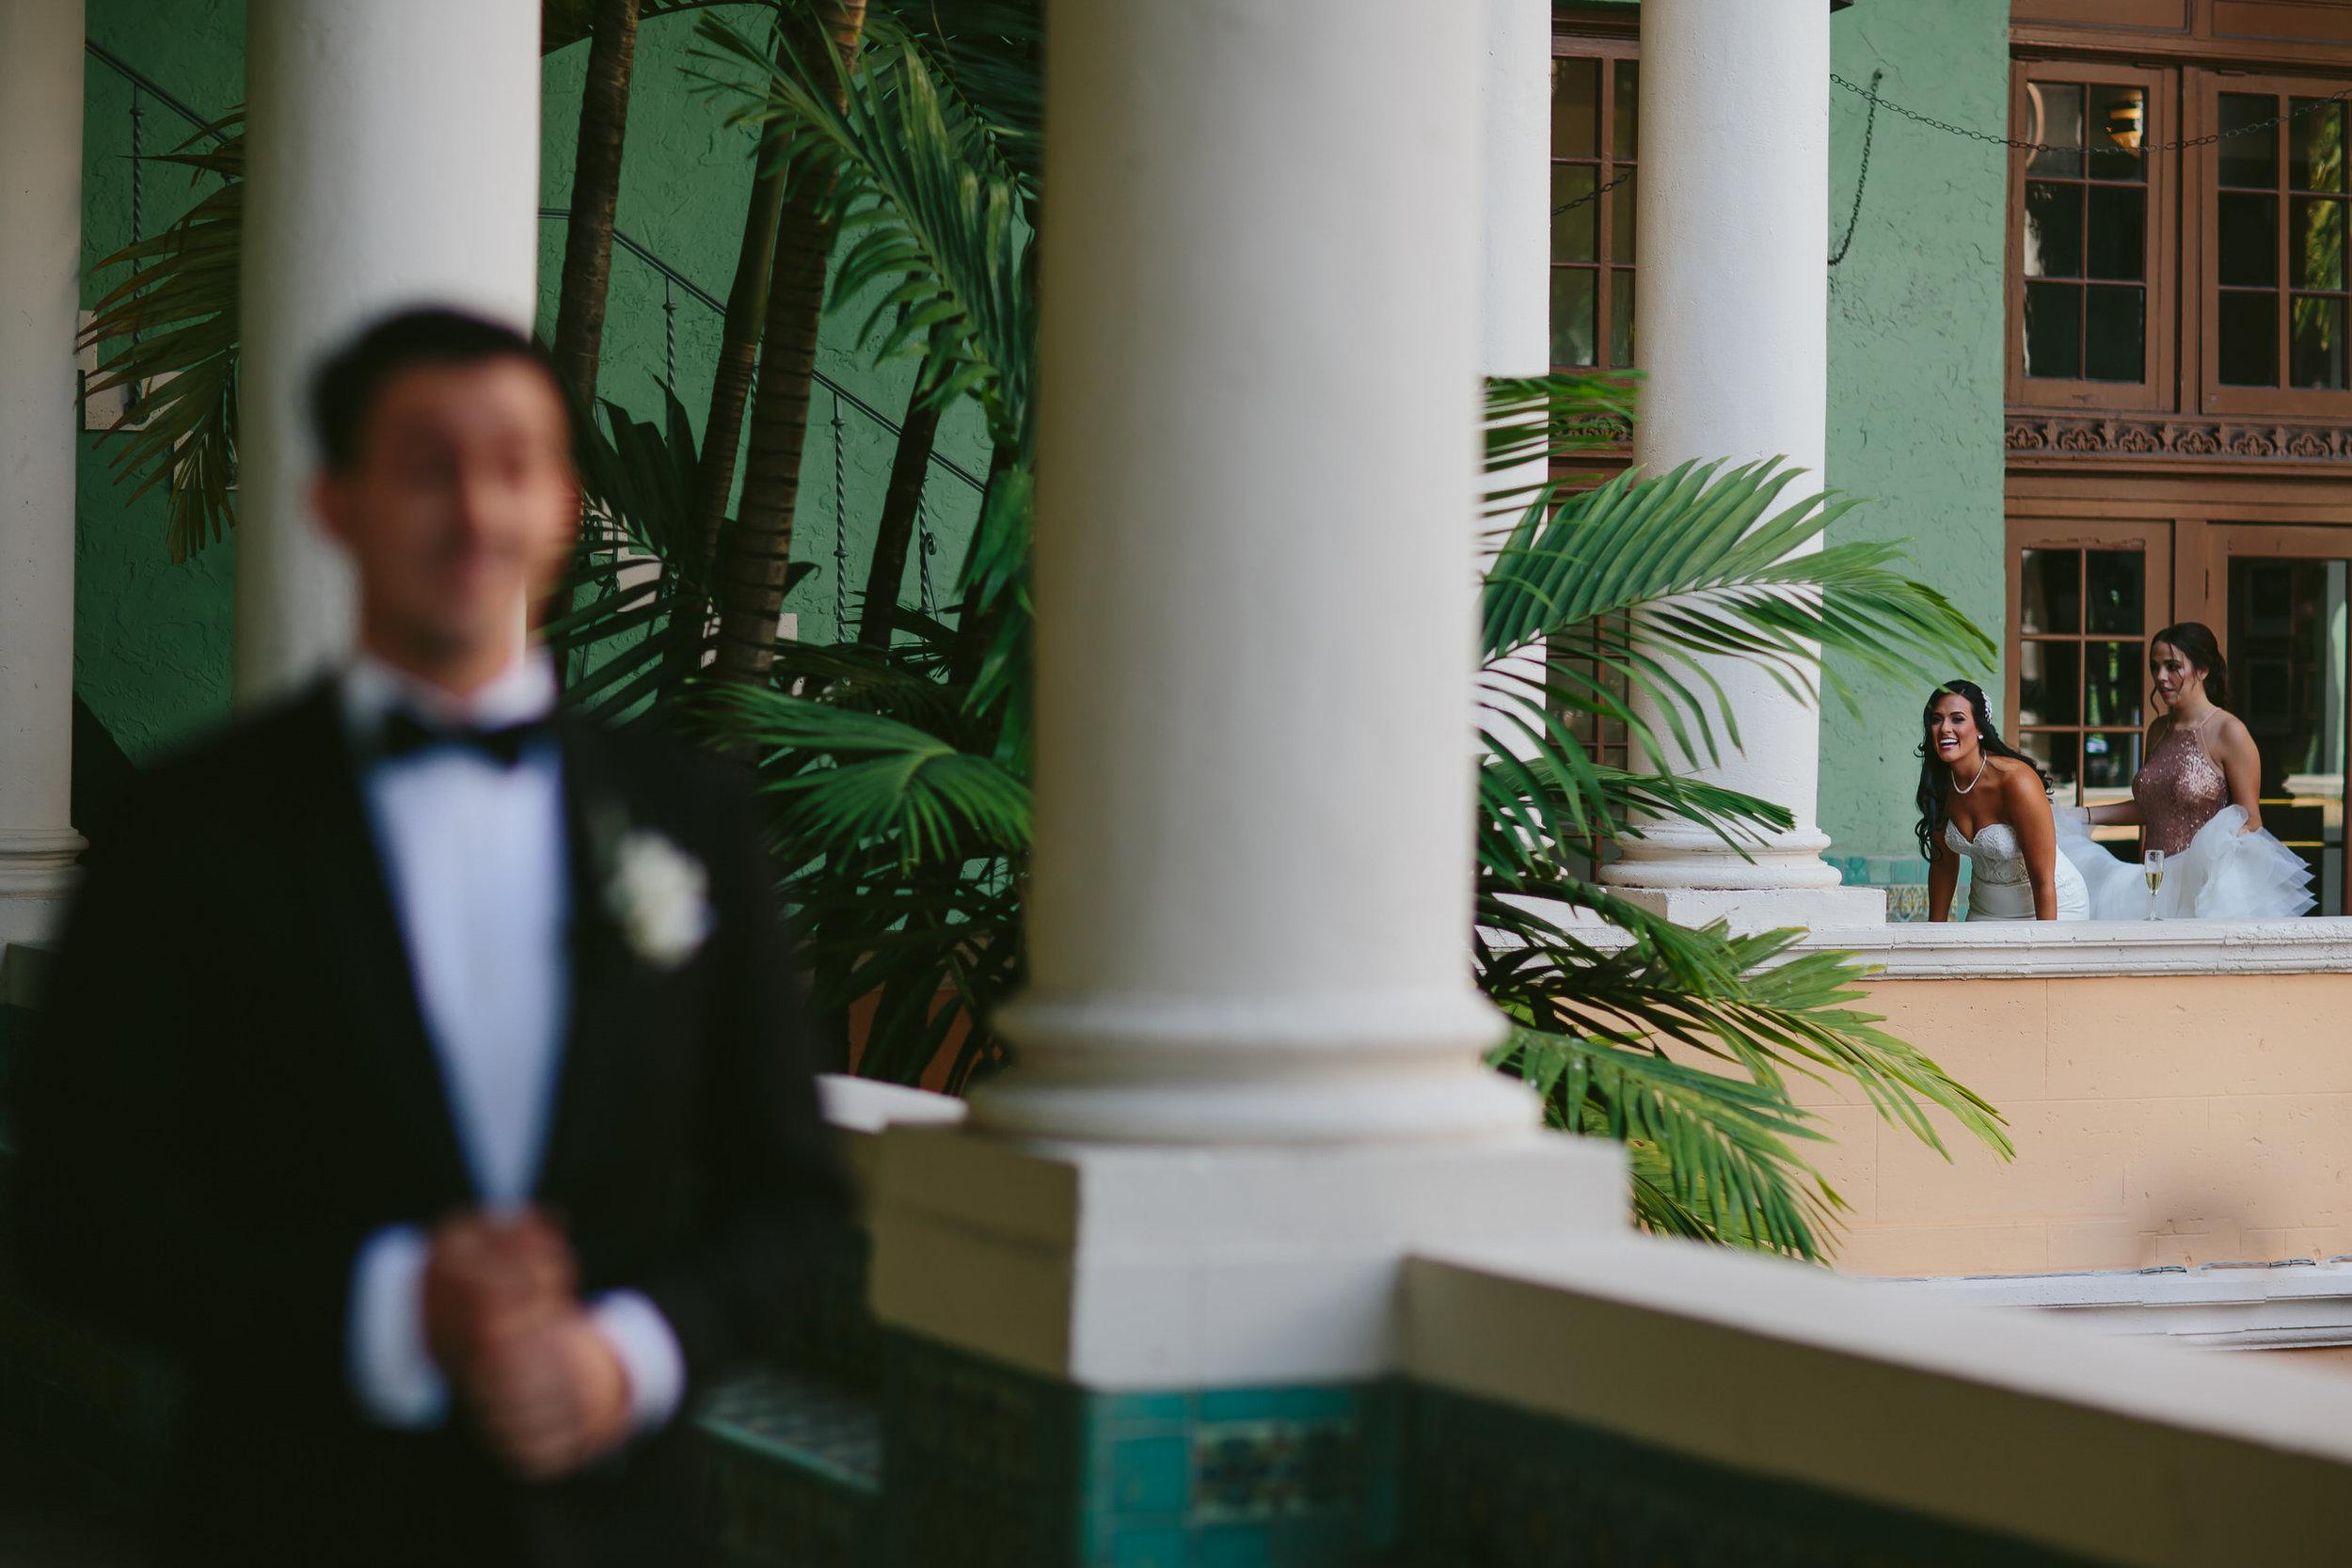 biltmore-wedding-steph-lynn-photo-photographer-bride-and-groom-2.jpg